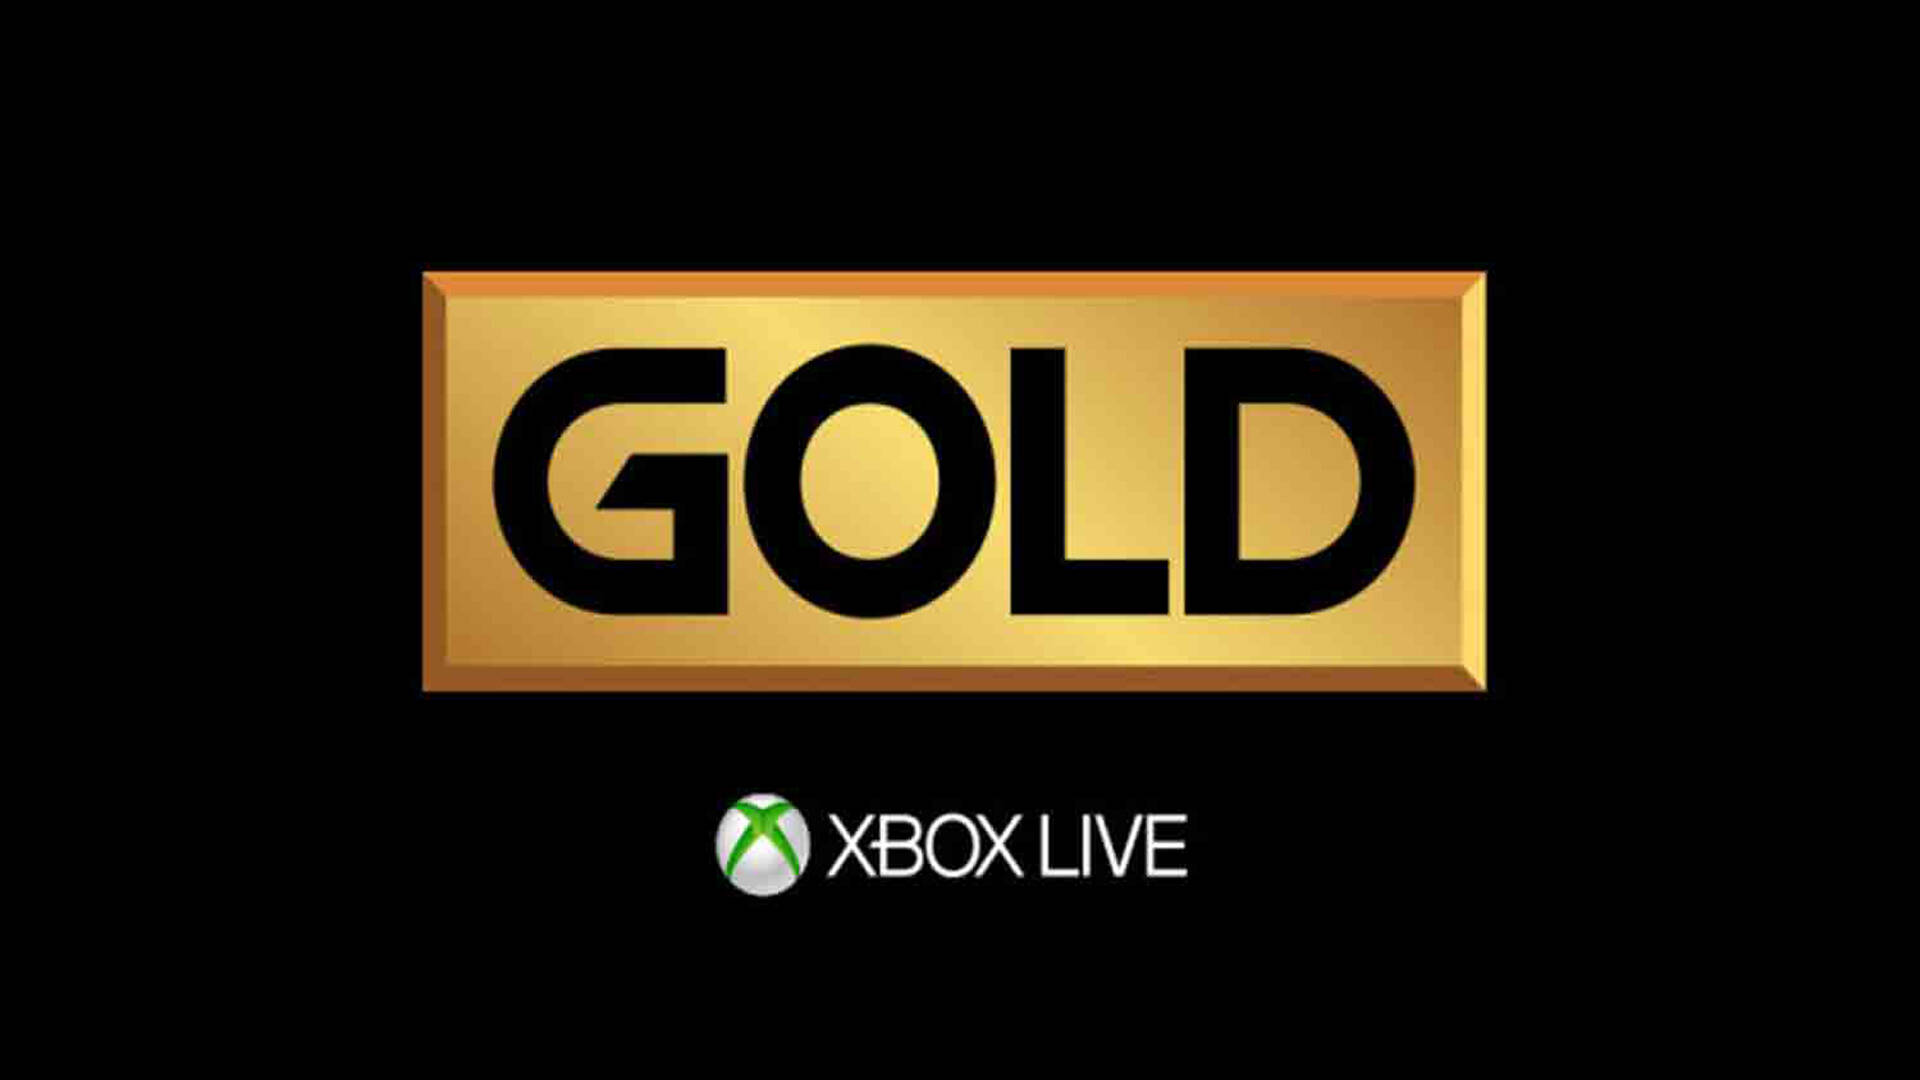 Xbox Gold Logo